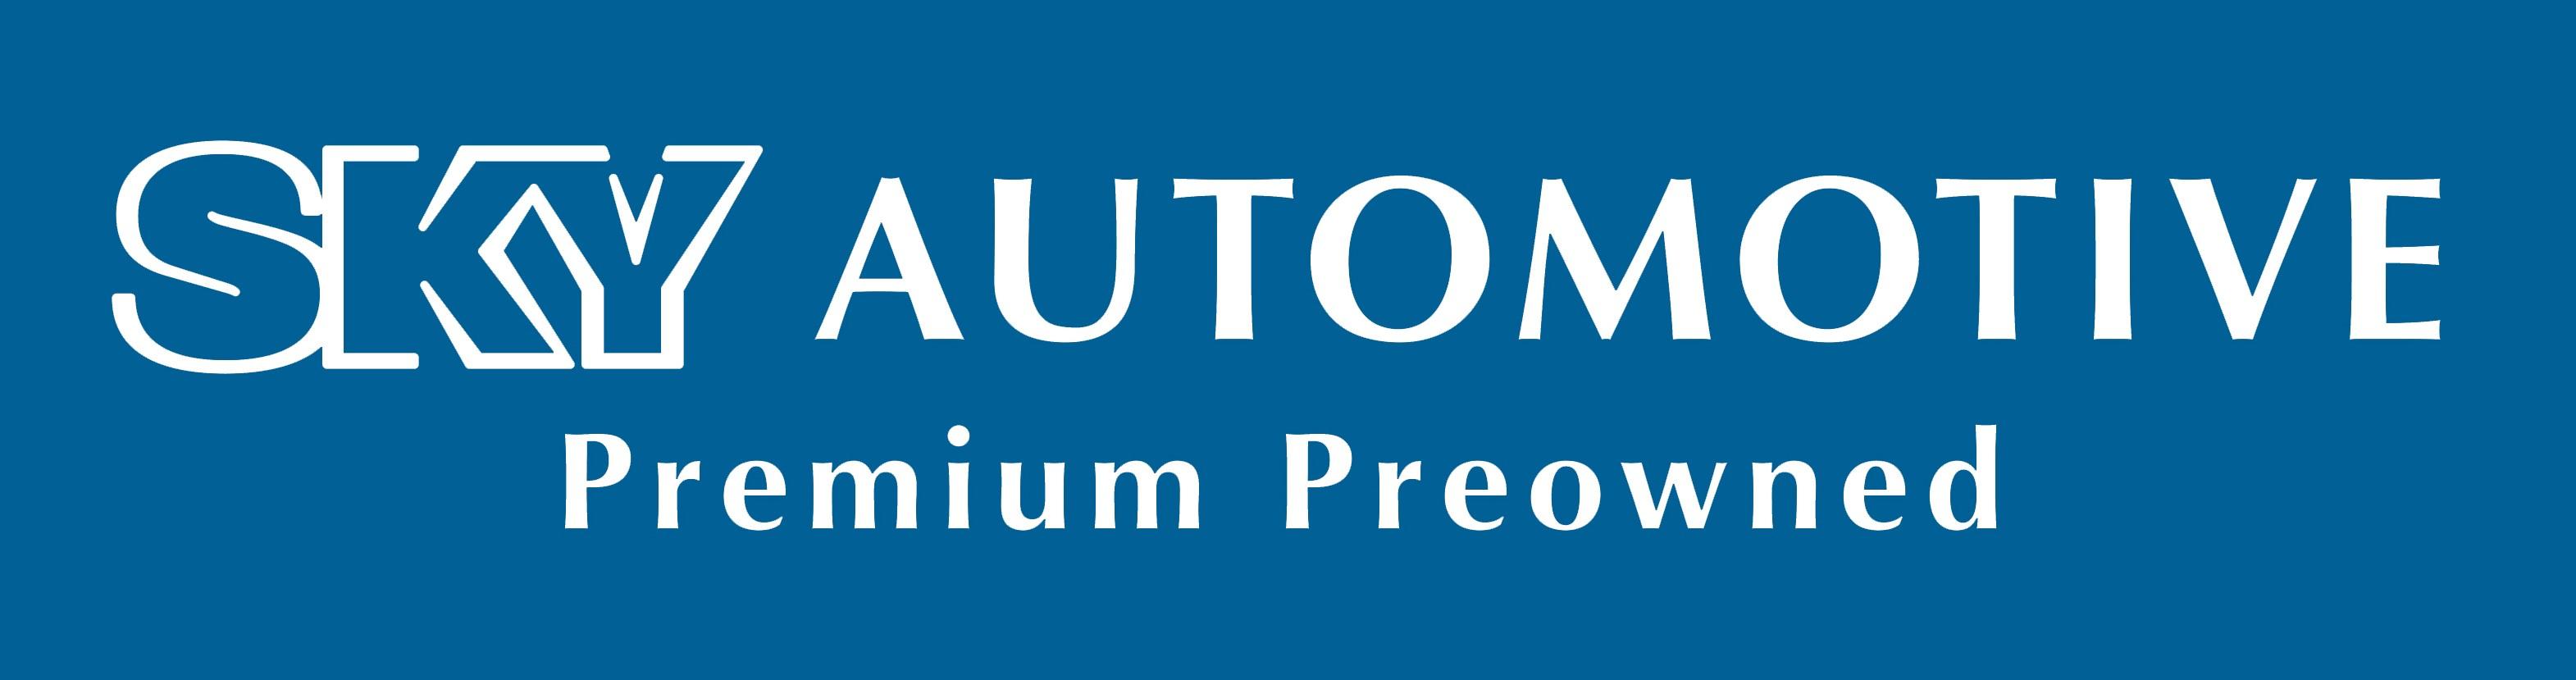 SKY Automotive Premium Preowned Logo